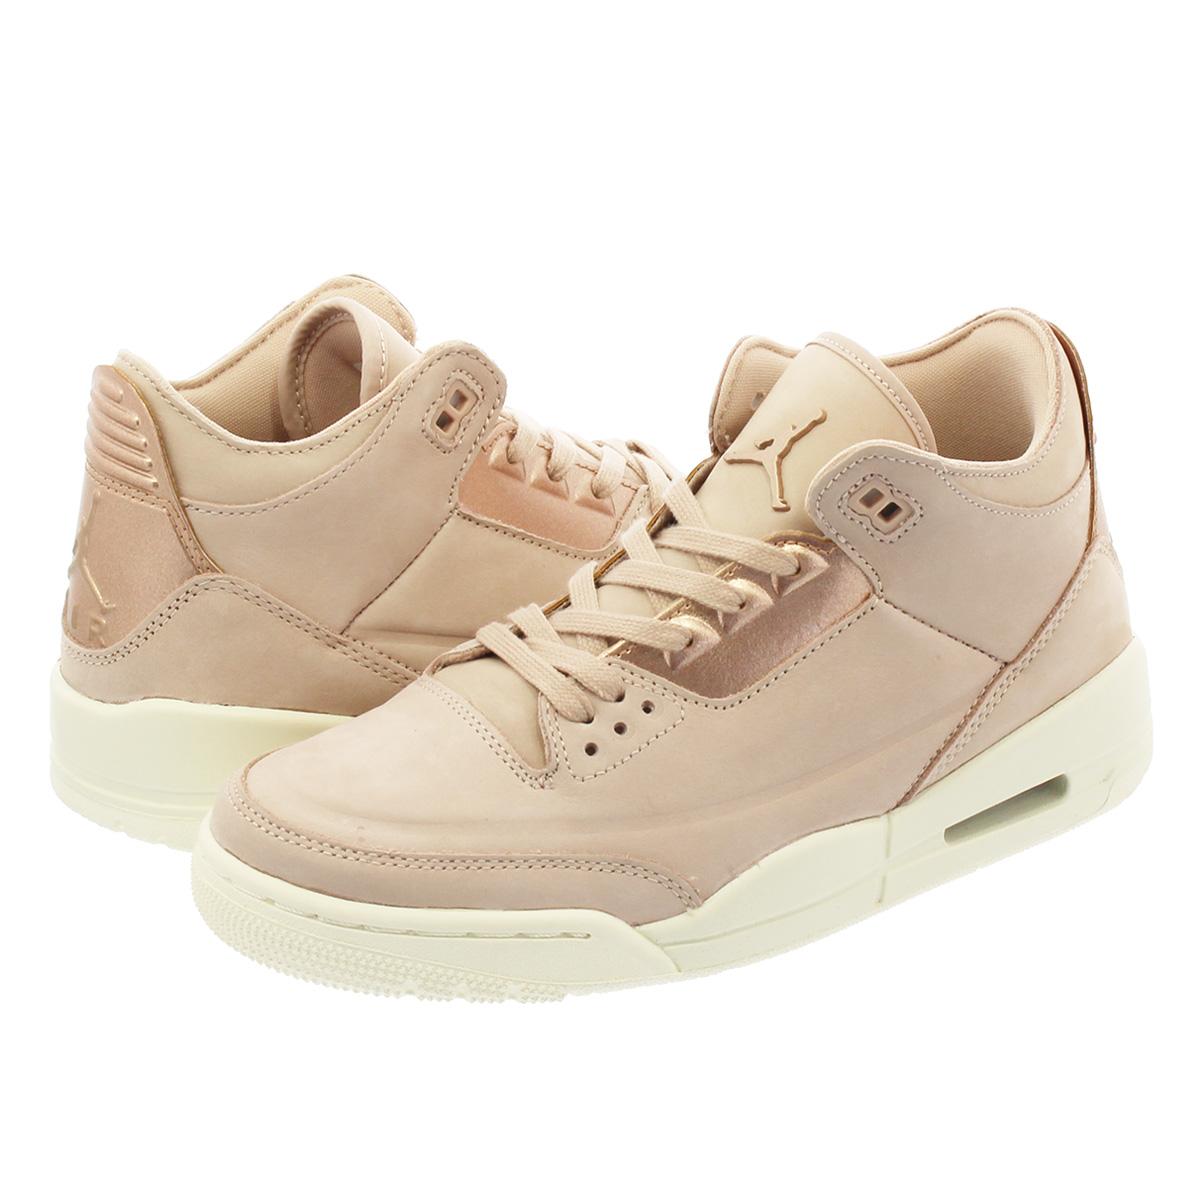 2c30789b6dc SELECT SHOP LOWTEX  NIKE WMNS AIR JORDAN 3 RETRO SE Nike women Air Jordan 3  nostalgic PARTICLE BEIGE METALLIC RED BRONZE SAIL ah7859-205